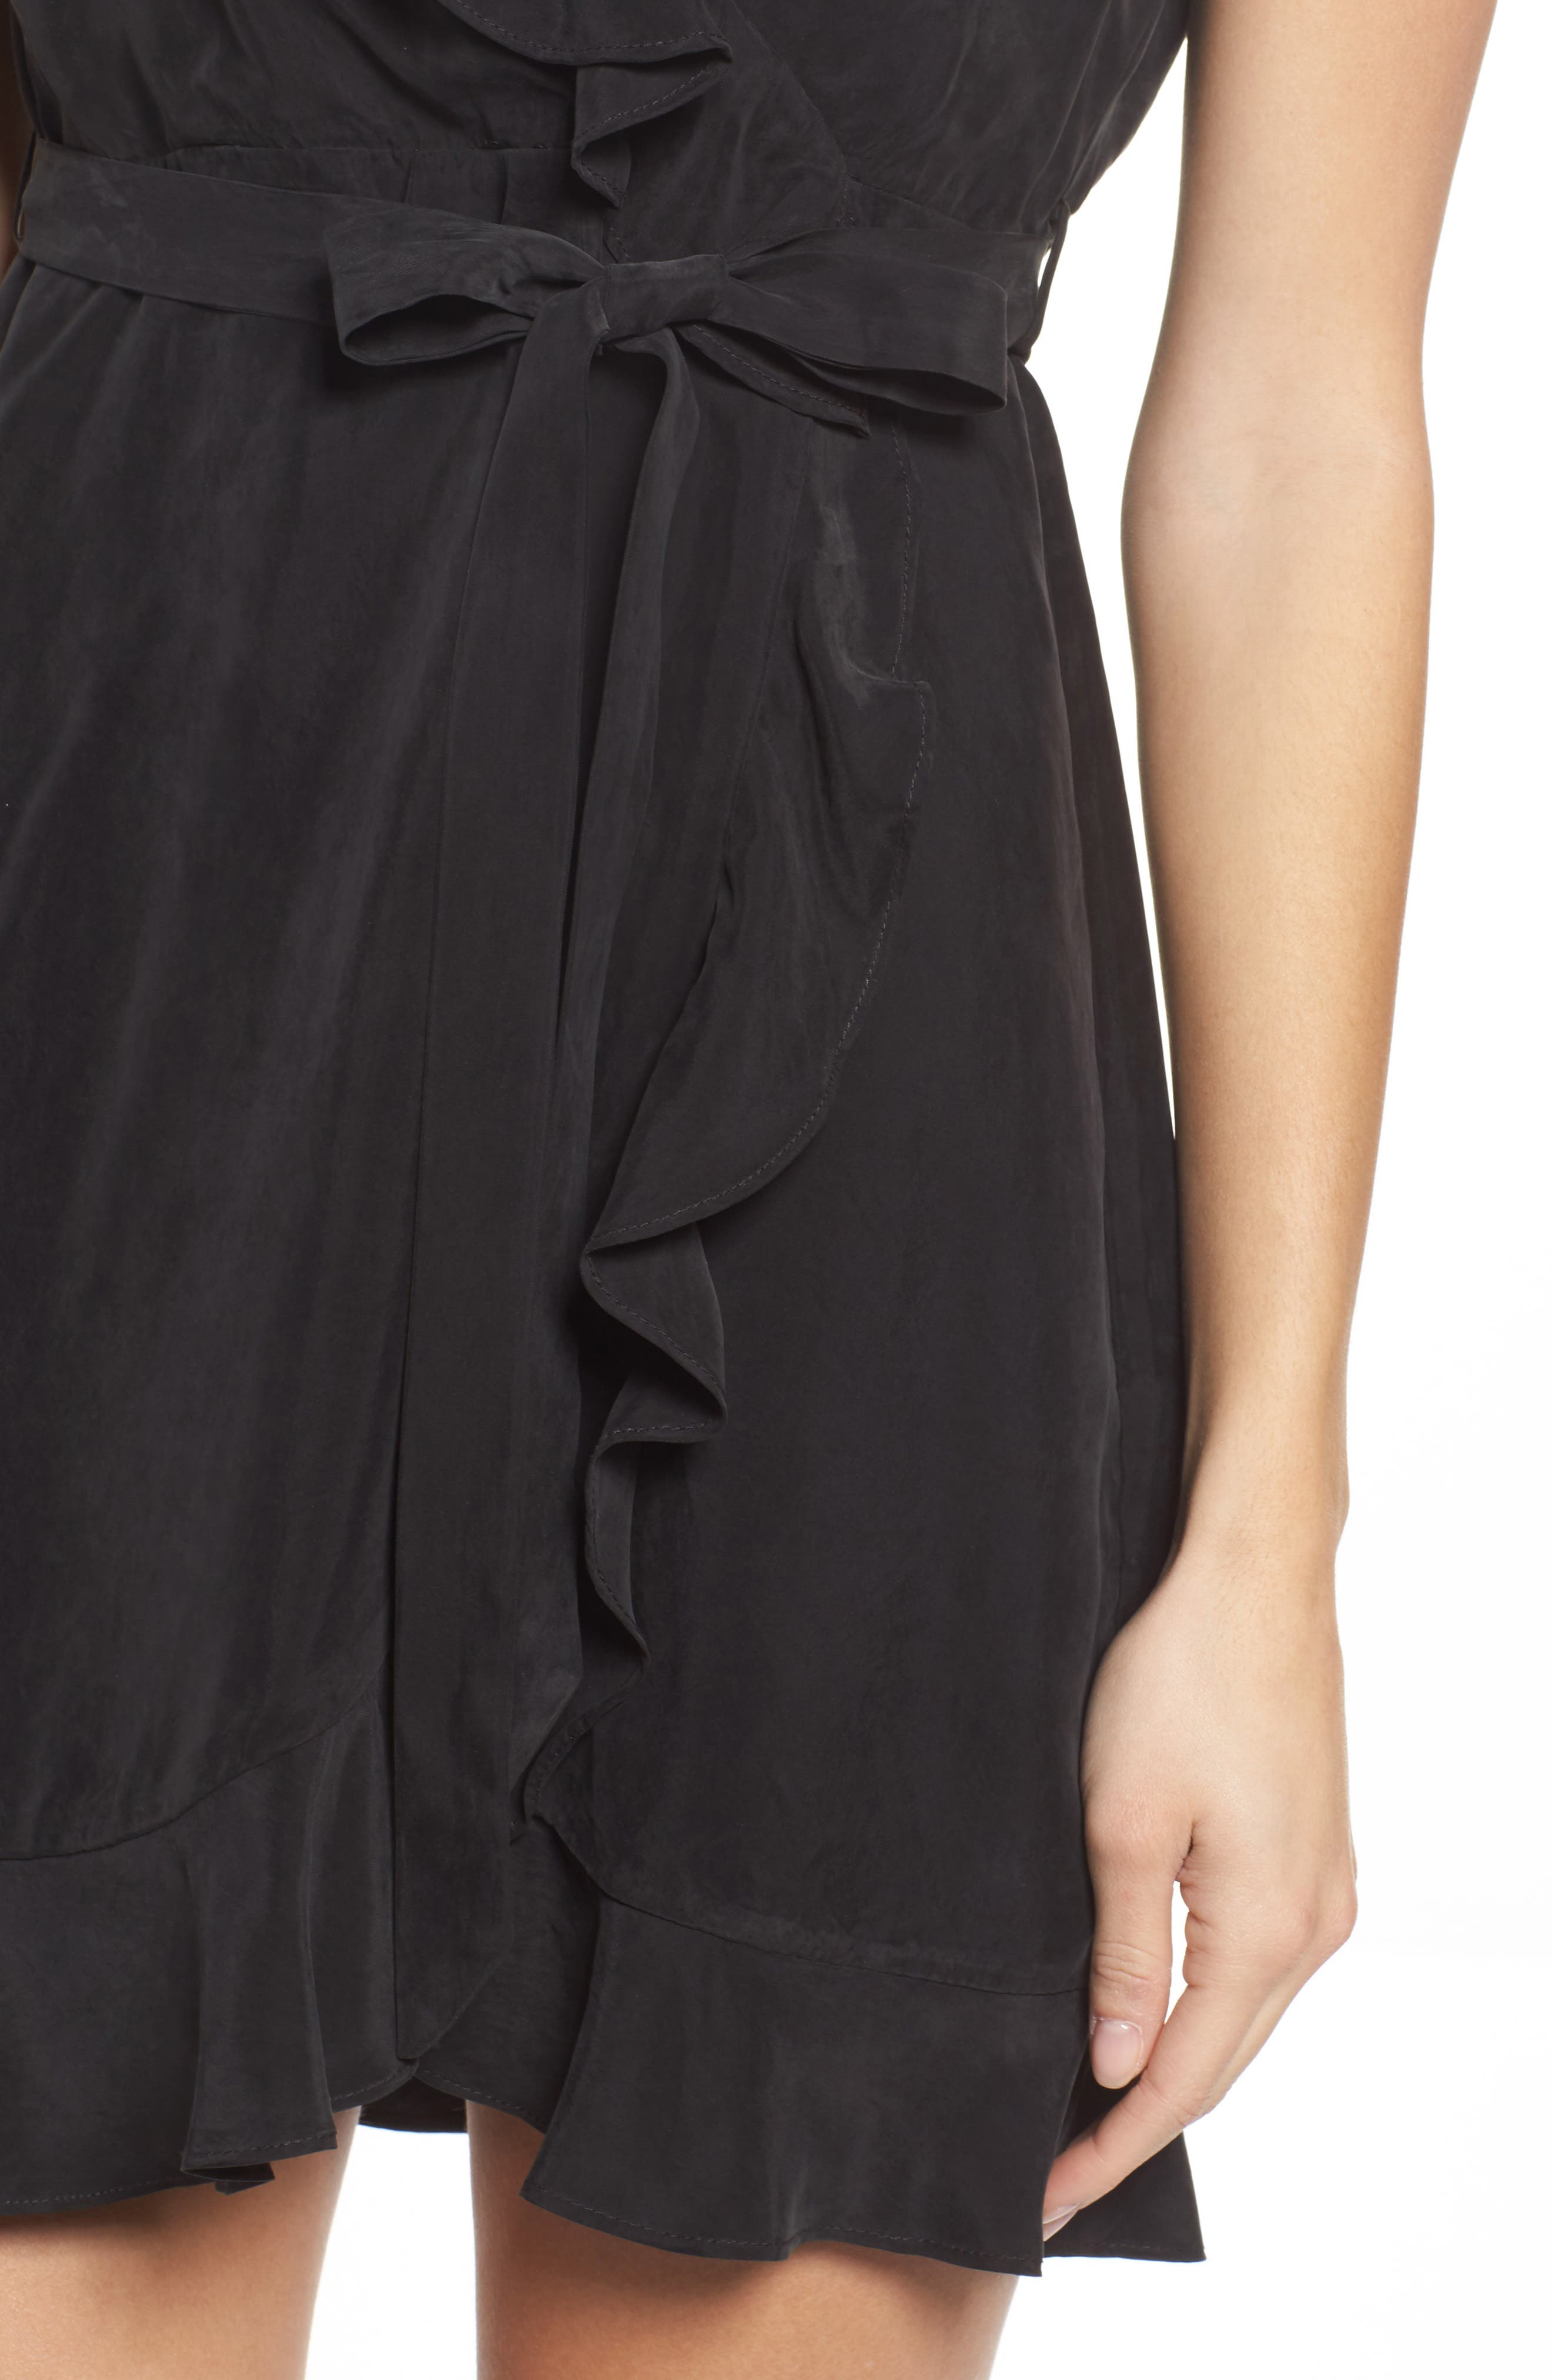 Milly One-Shoulder Wrap Dress,                             Alternate thumbnail 4, color,                             Black